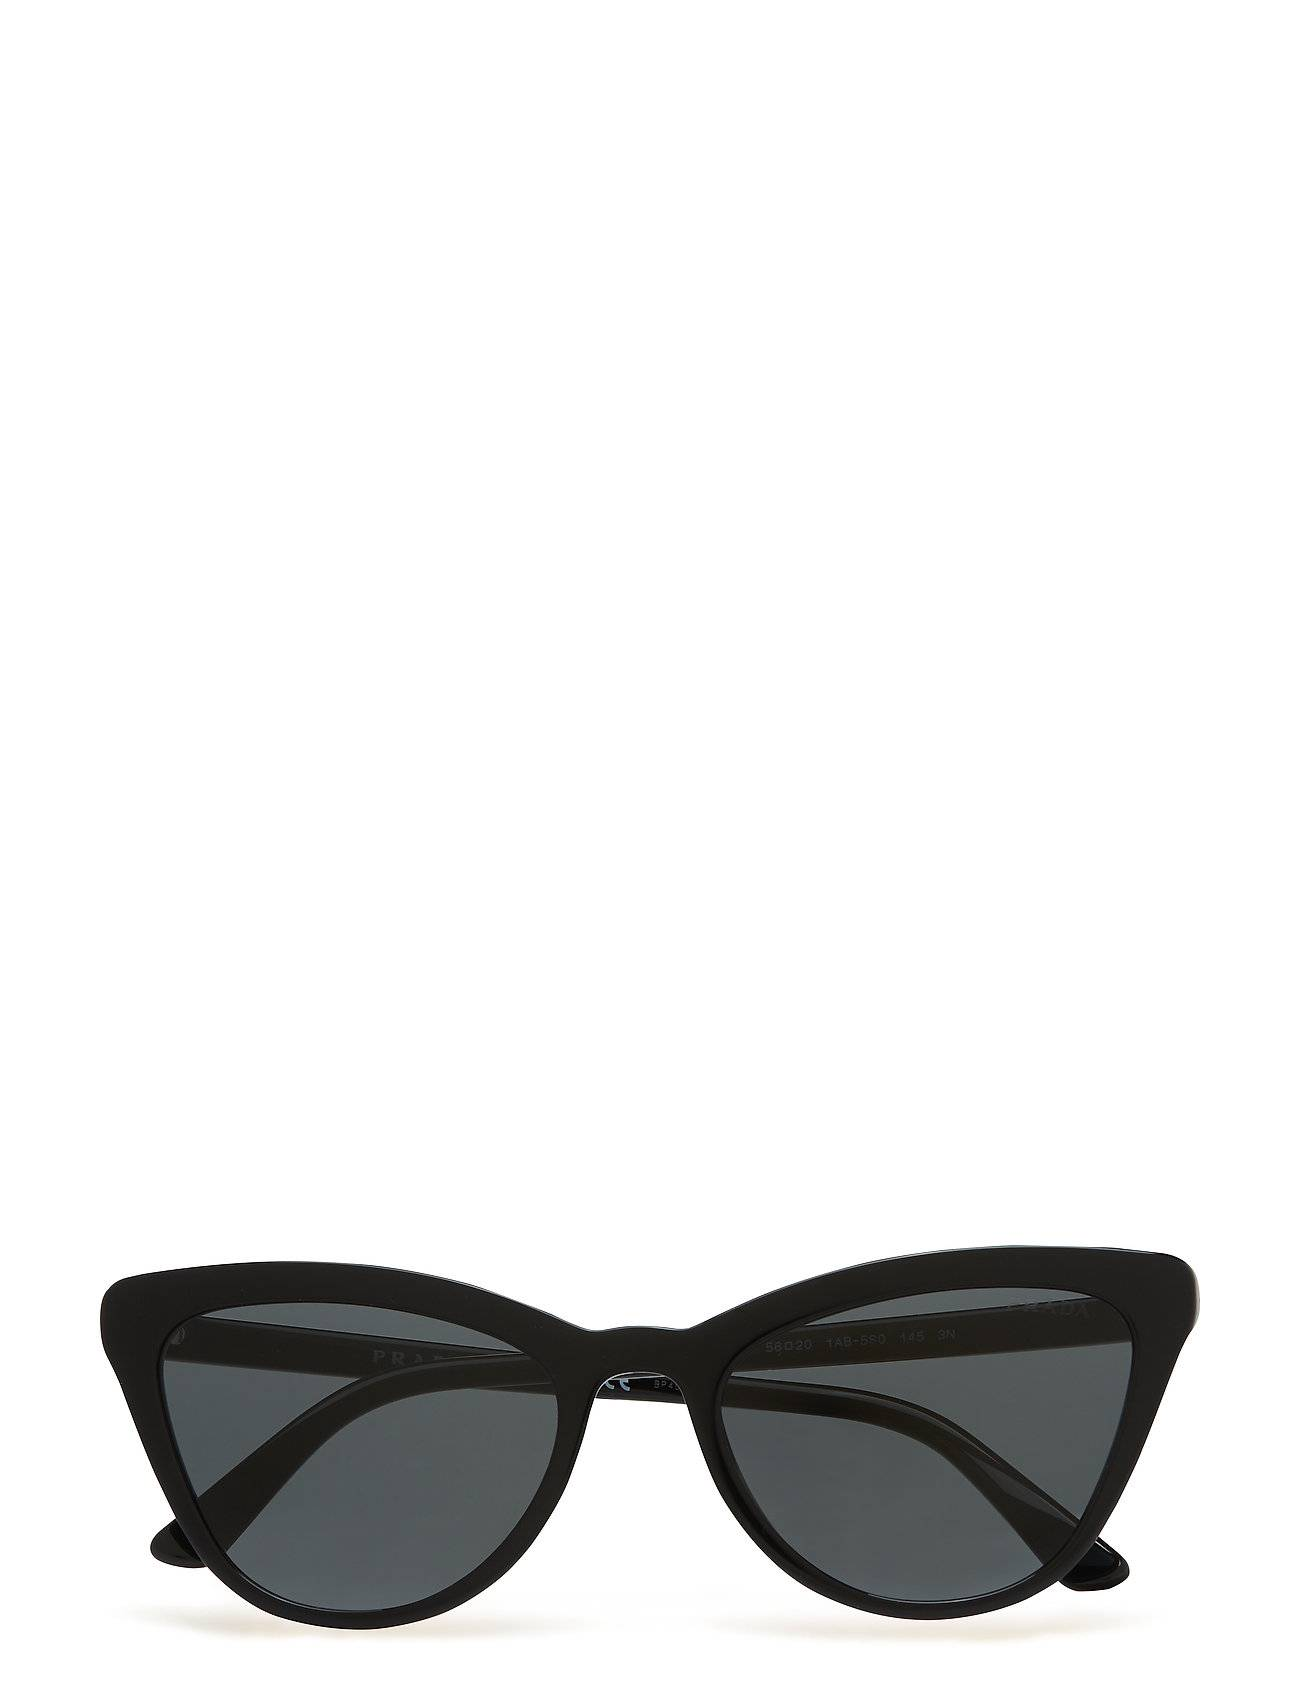 Image of Prada Sunglasses 0pr 01vs Aurinkolasit Musta